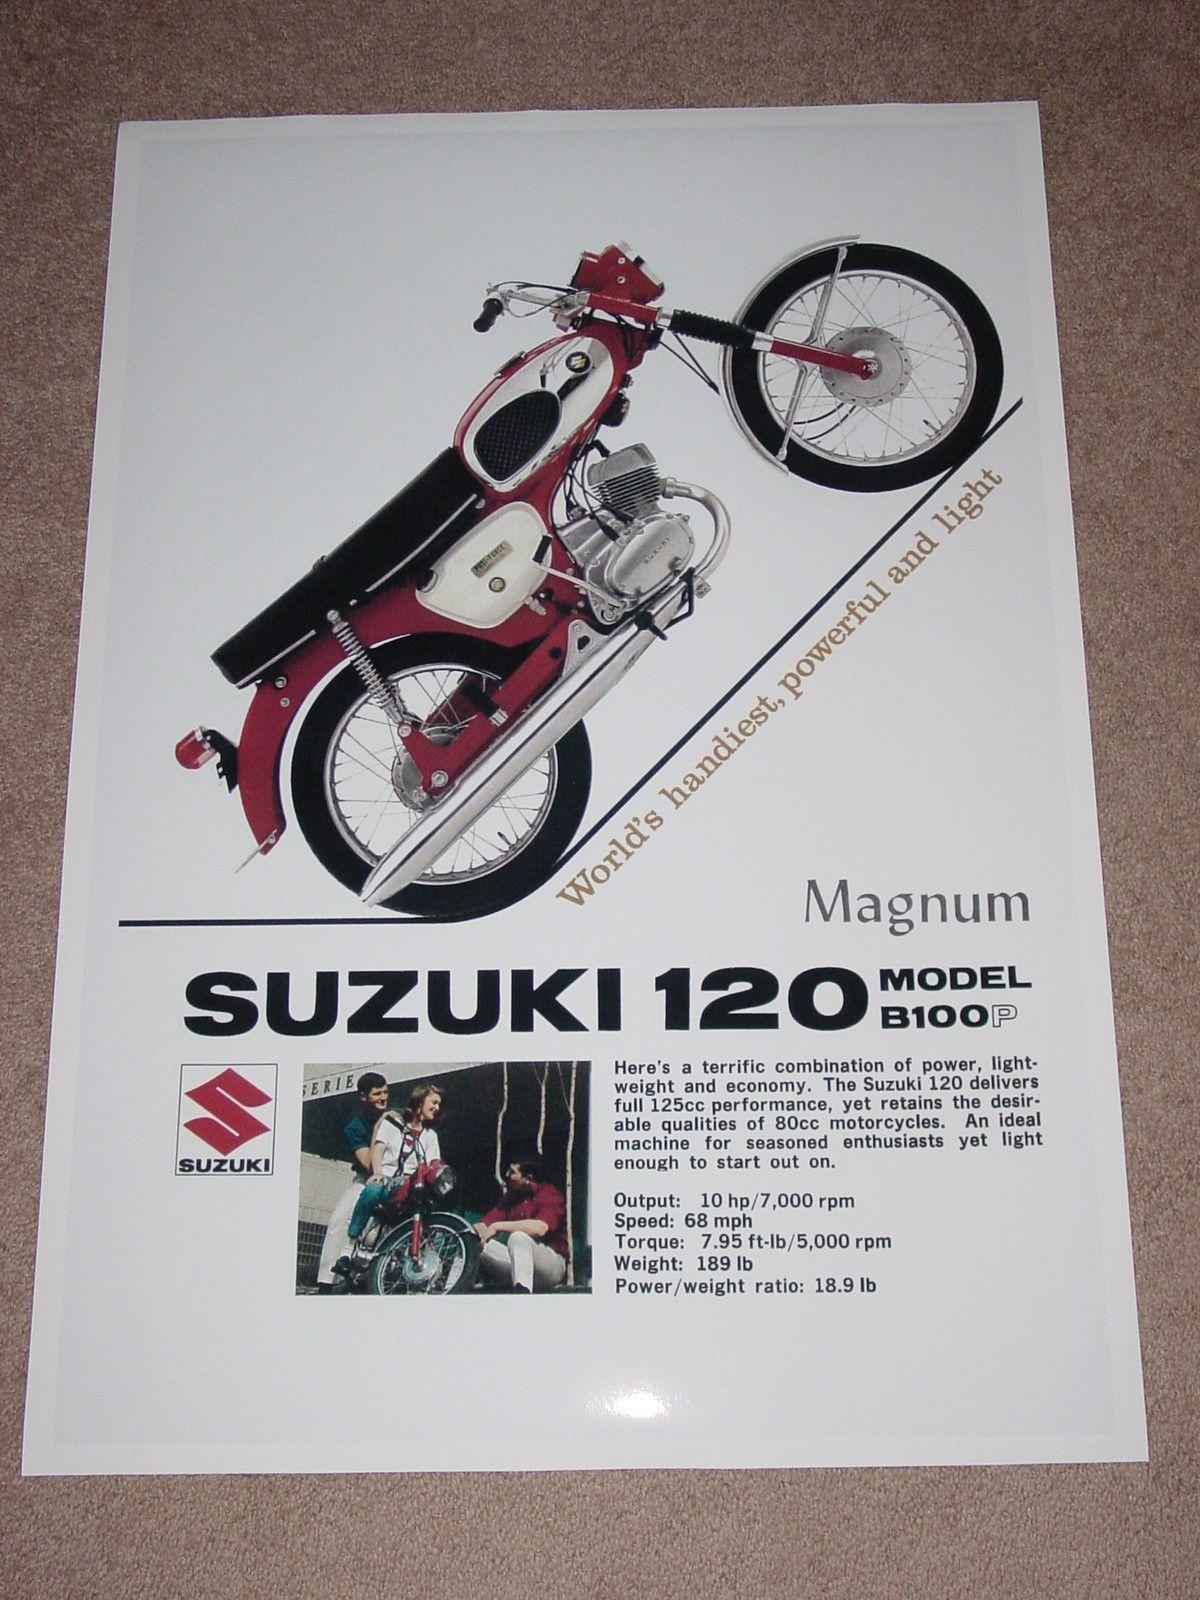 Großzügig Plakatrahmen 36 X 24 Bilder - Benutzerdefinierte ...